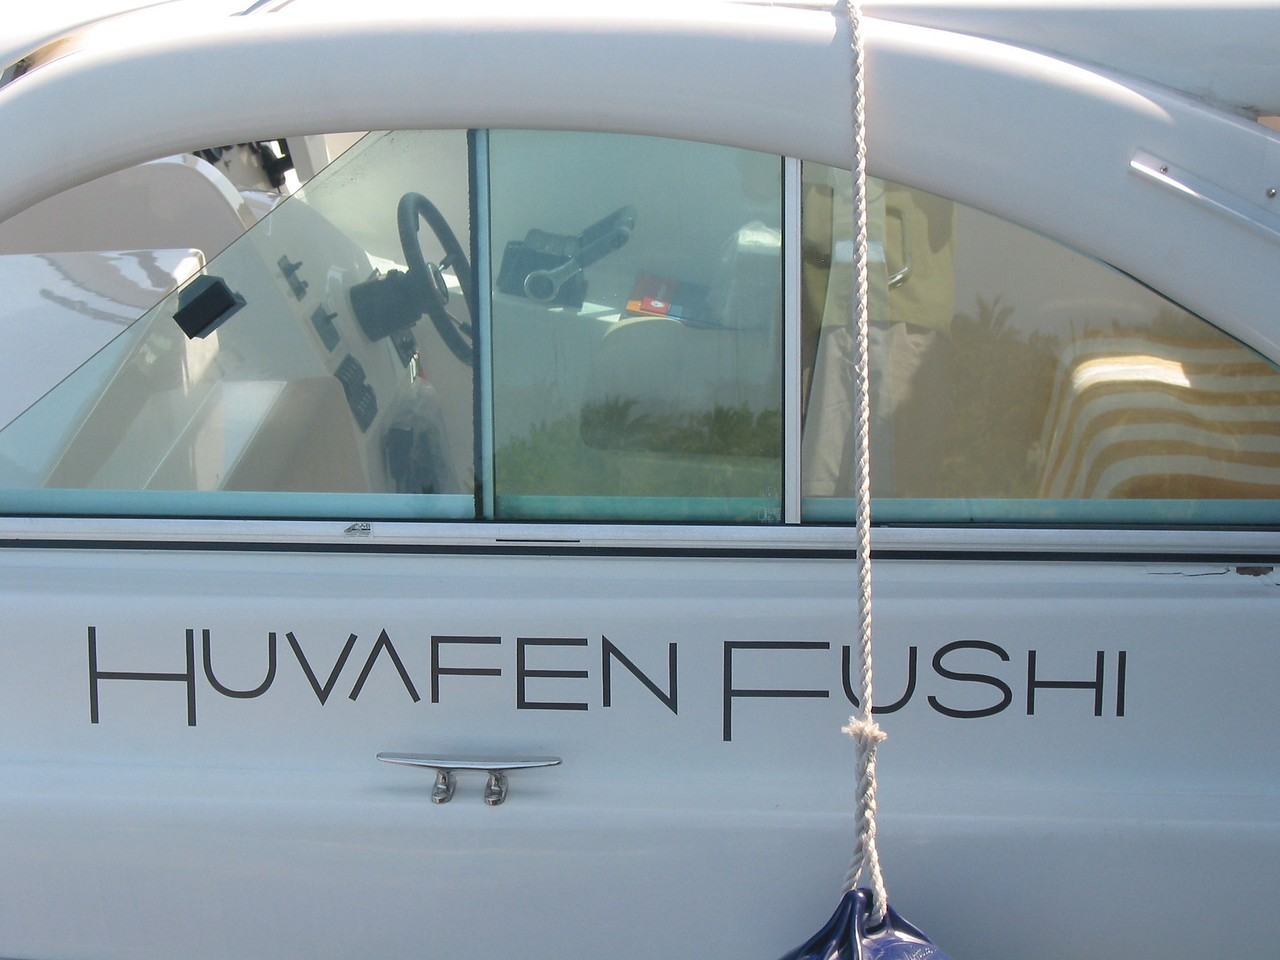 Huvafen Fushi is a private resort island in the North Malé atoll, Kaafu, Maldives Indian Ocean.